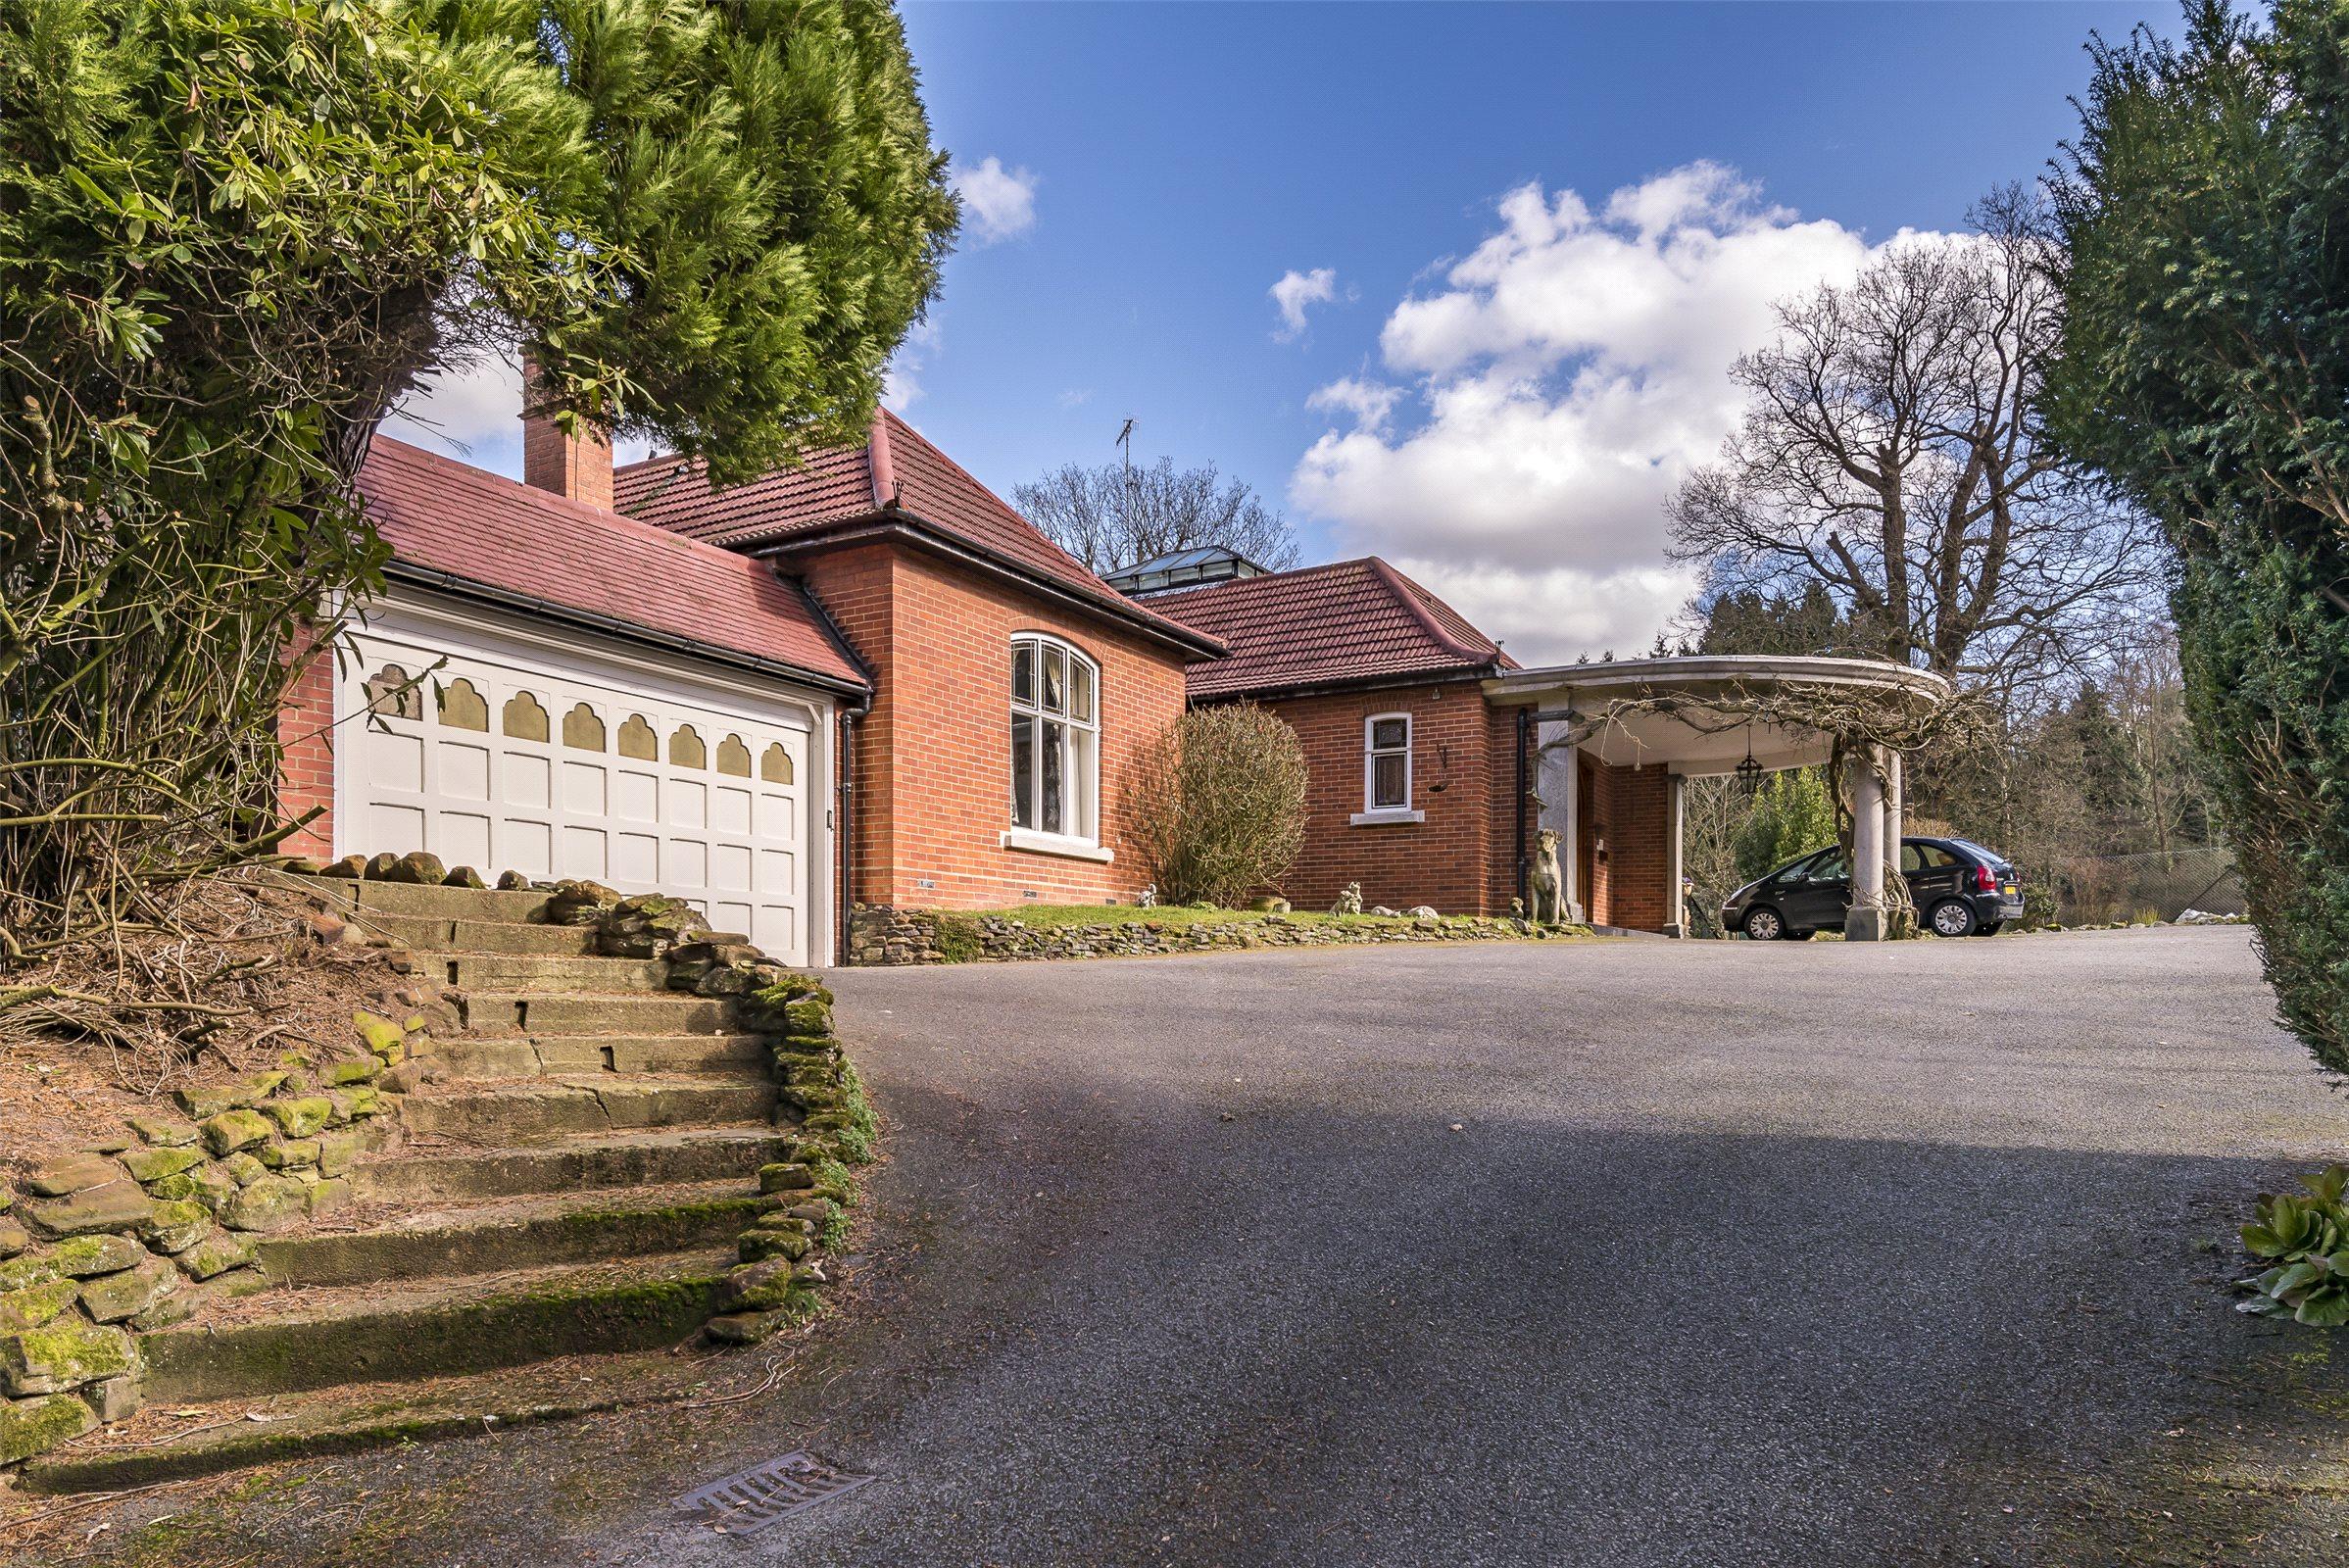 5 Bedroom Property For Sale In Reigate Road, Dorking, Surrey,